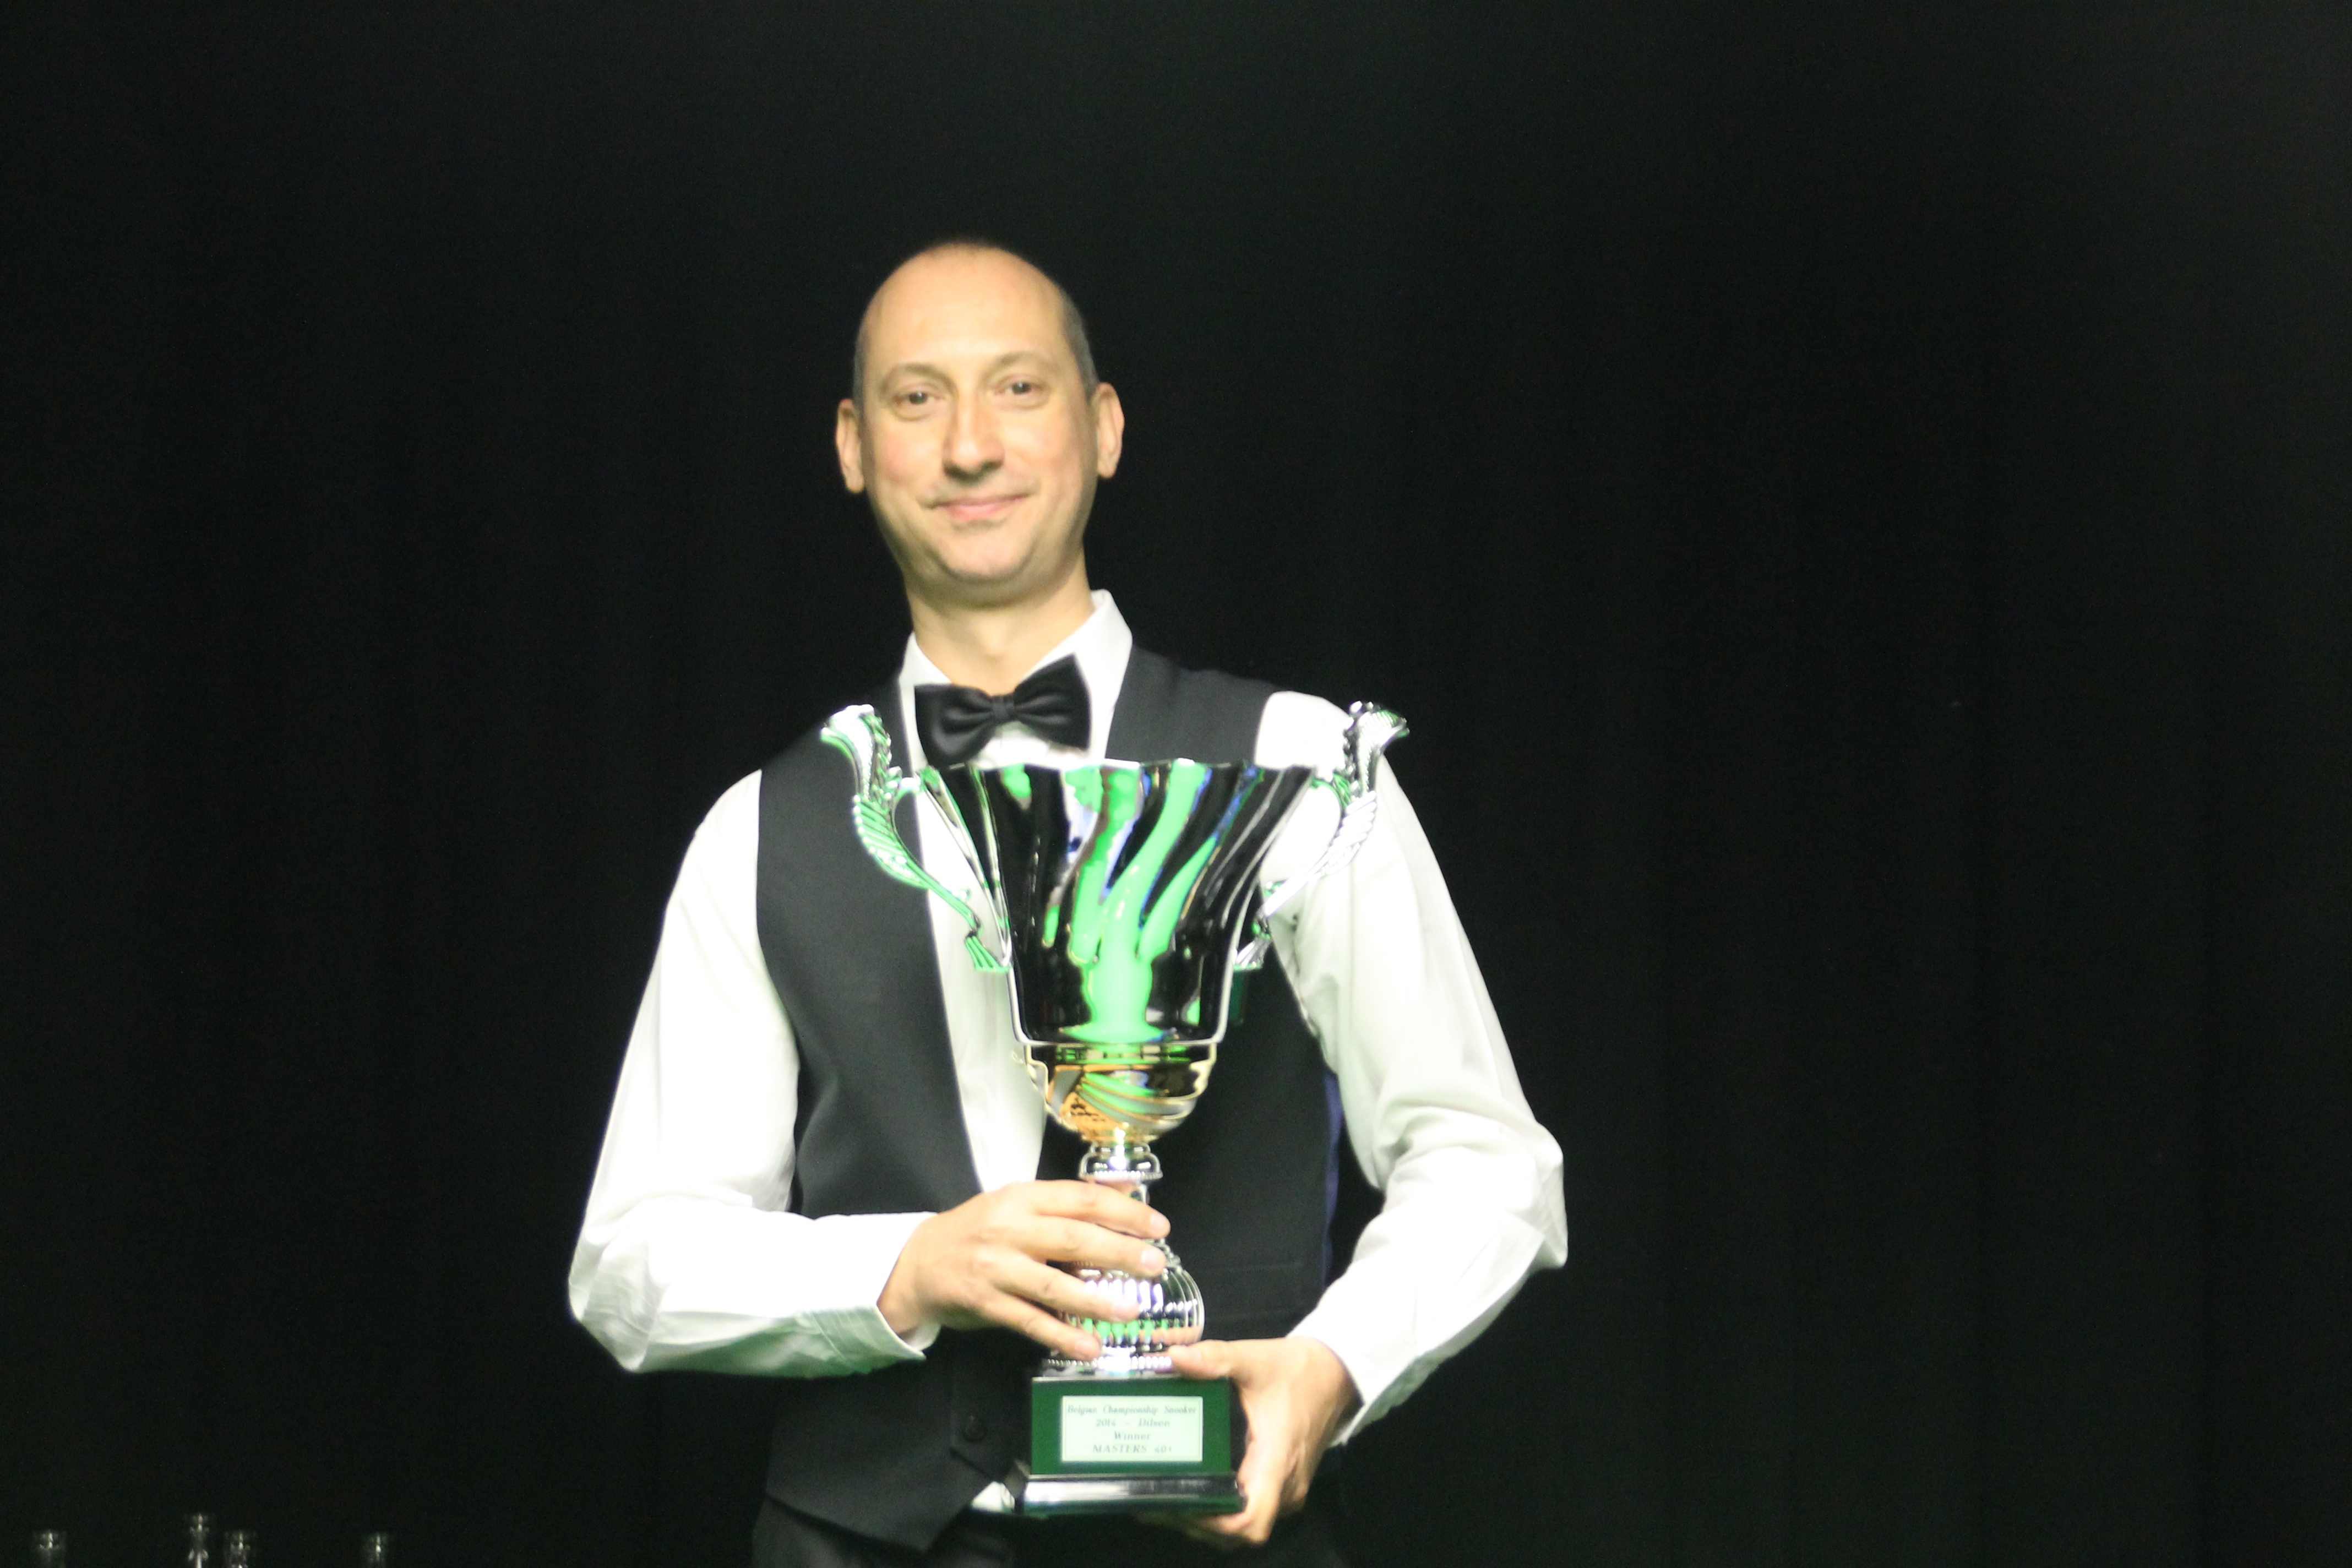 Yvan Van Velthoven wins second Belgian Championship Master's Crown